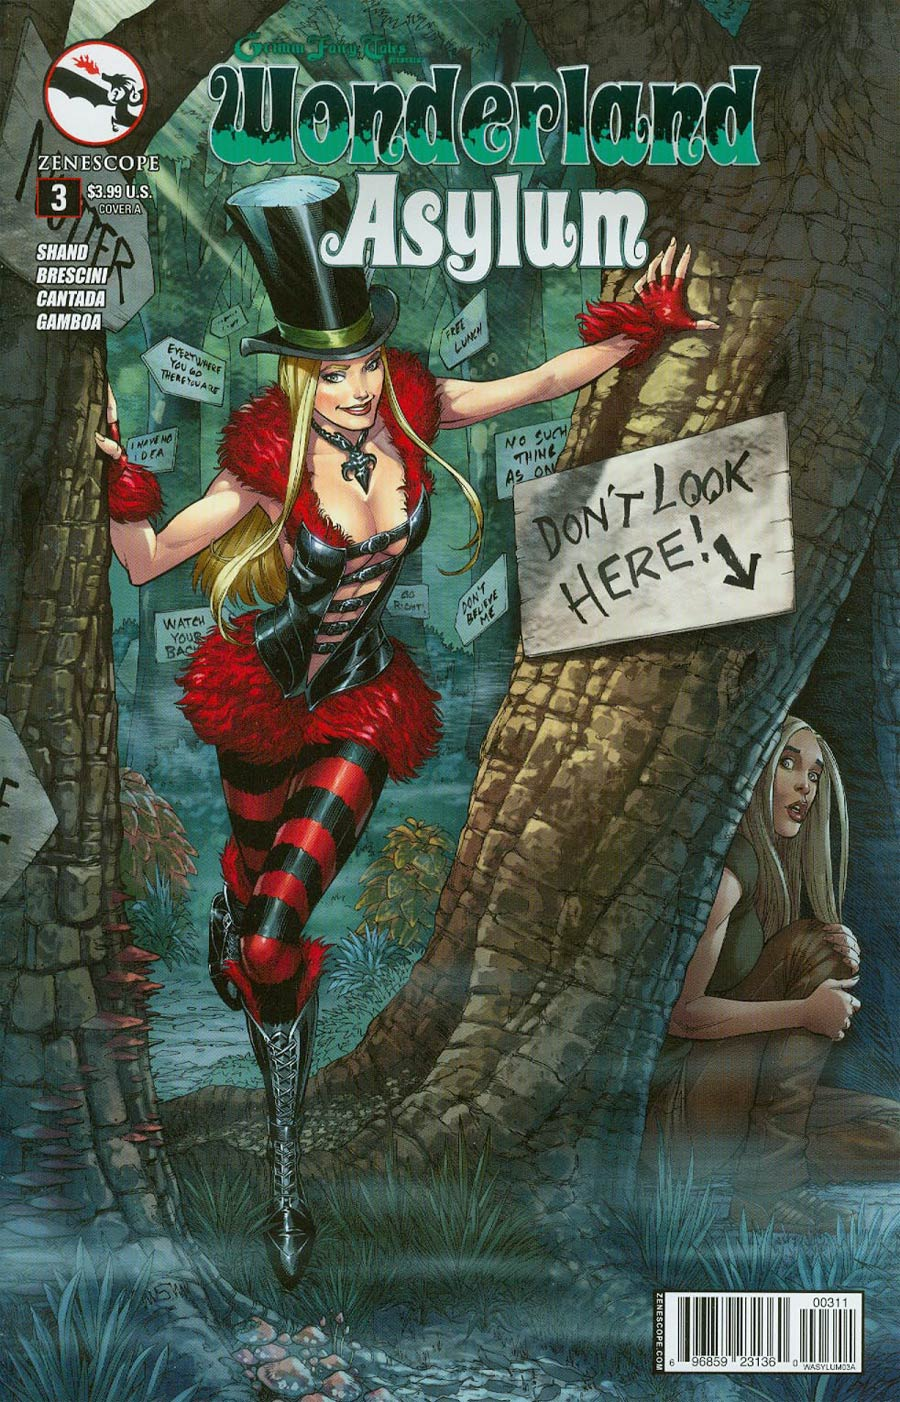 Grimm Fairy Tales Presents Wonderland Asylum #3 Cover A Mike S Miller